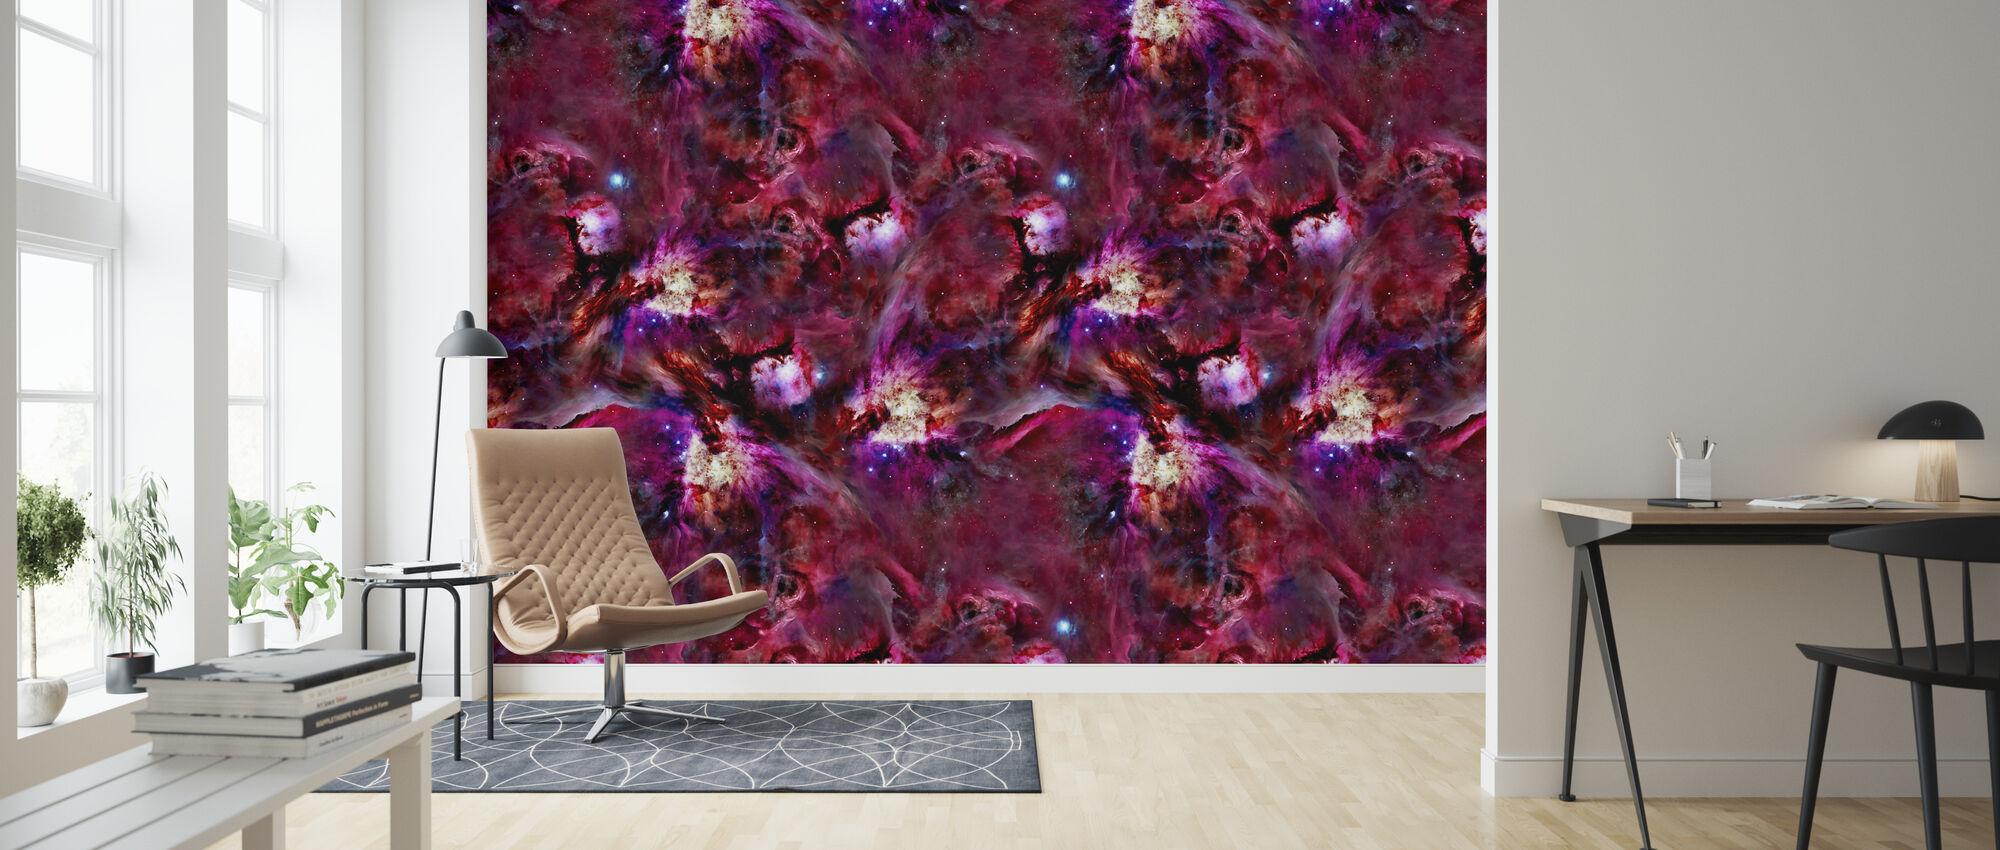 Gauardian - Wallpaper - Living Room